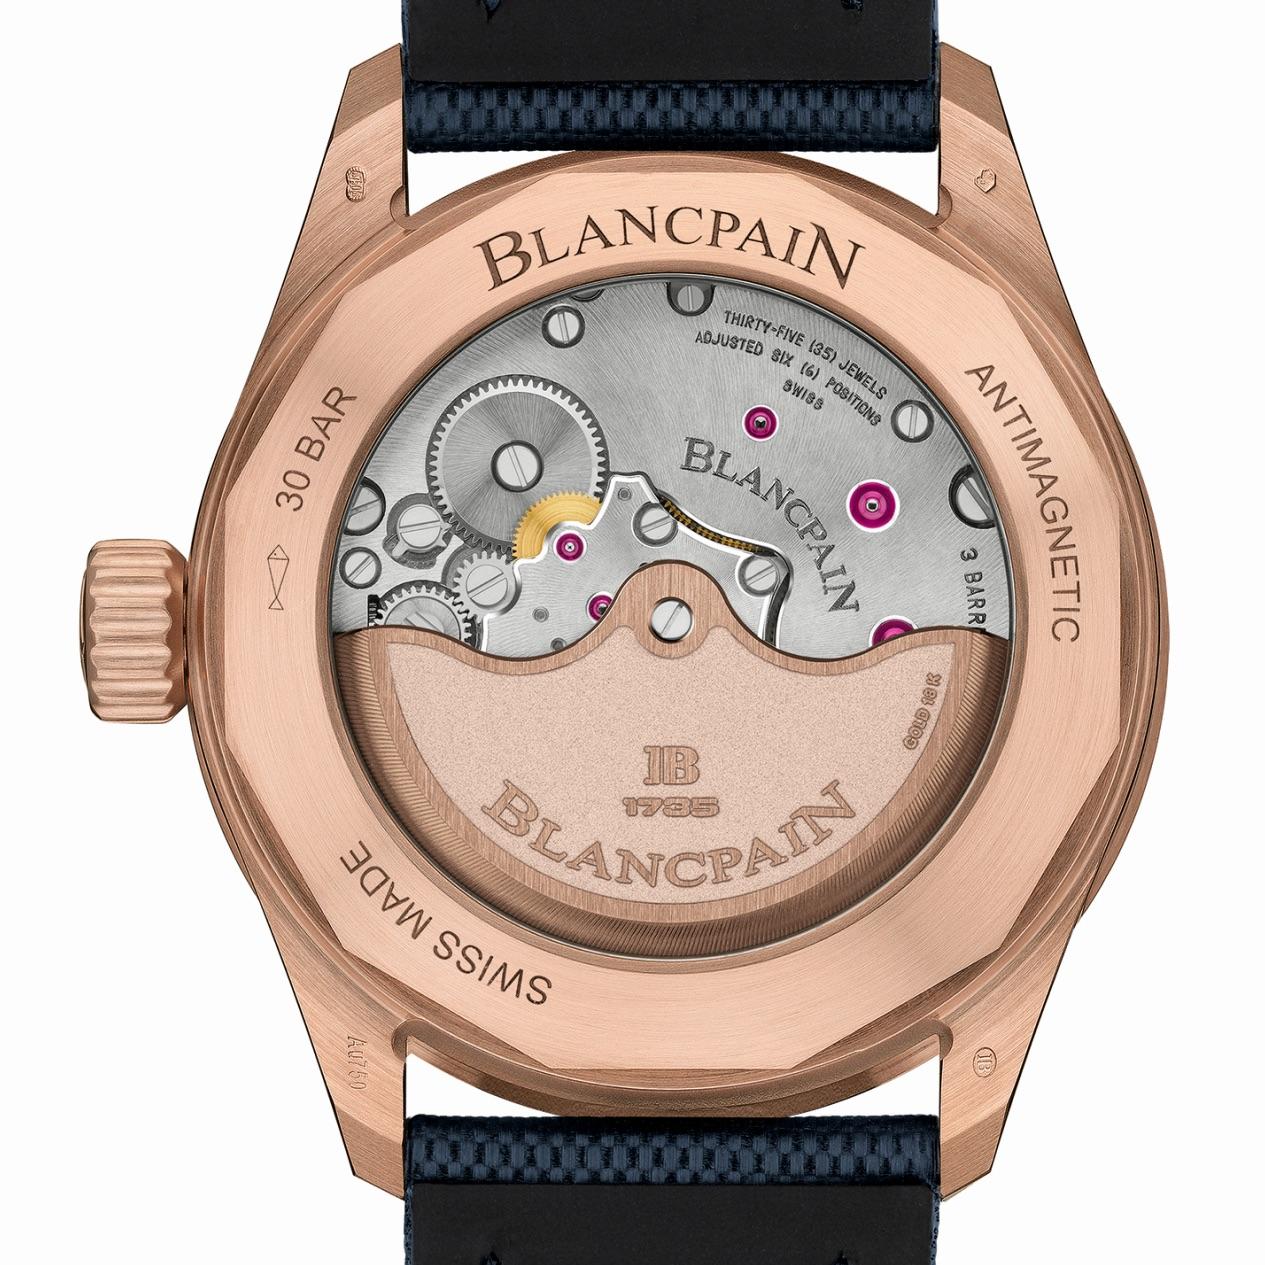 2020 Blancpain Fifty Fathoms Bathyscaphe Sedna Gold